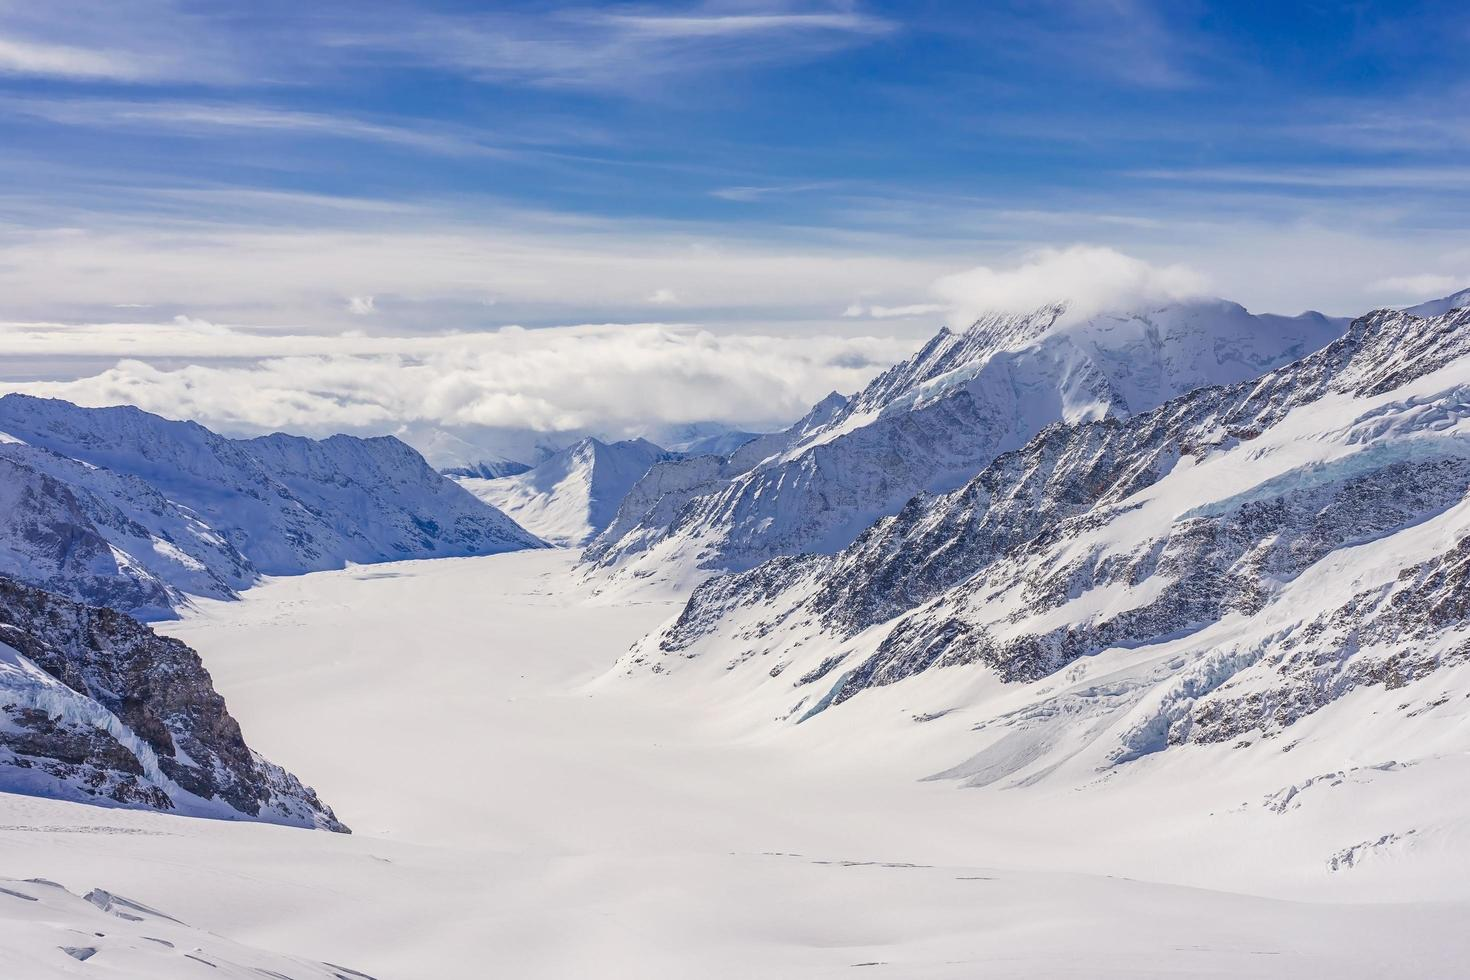 Jungfraujoch - glaciar aletsch o glaciar fletsch, suiza foto